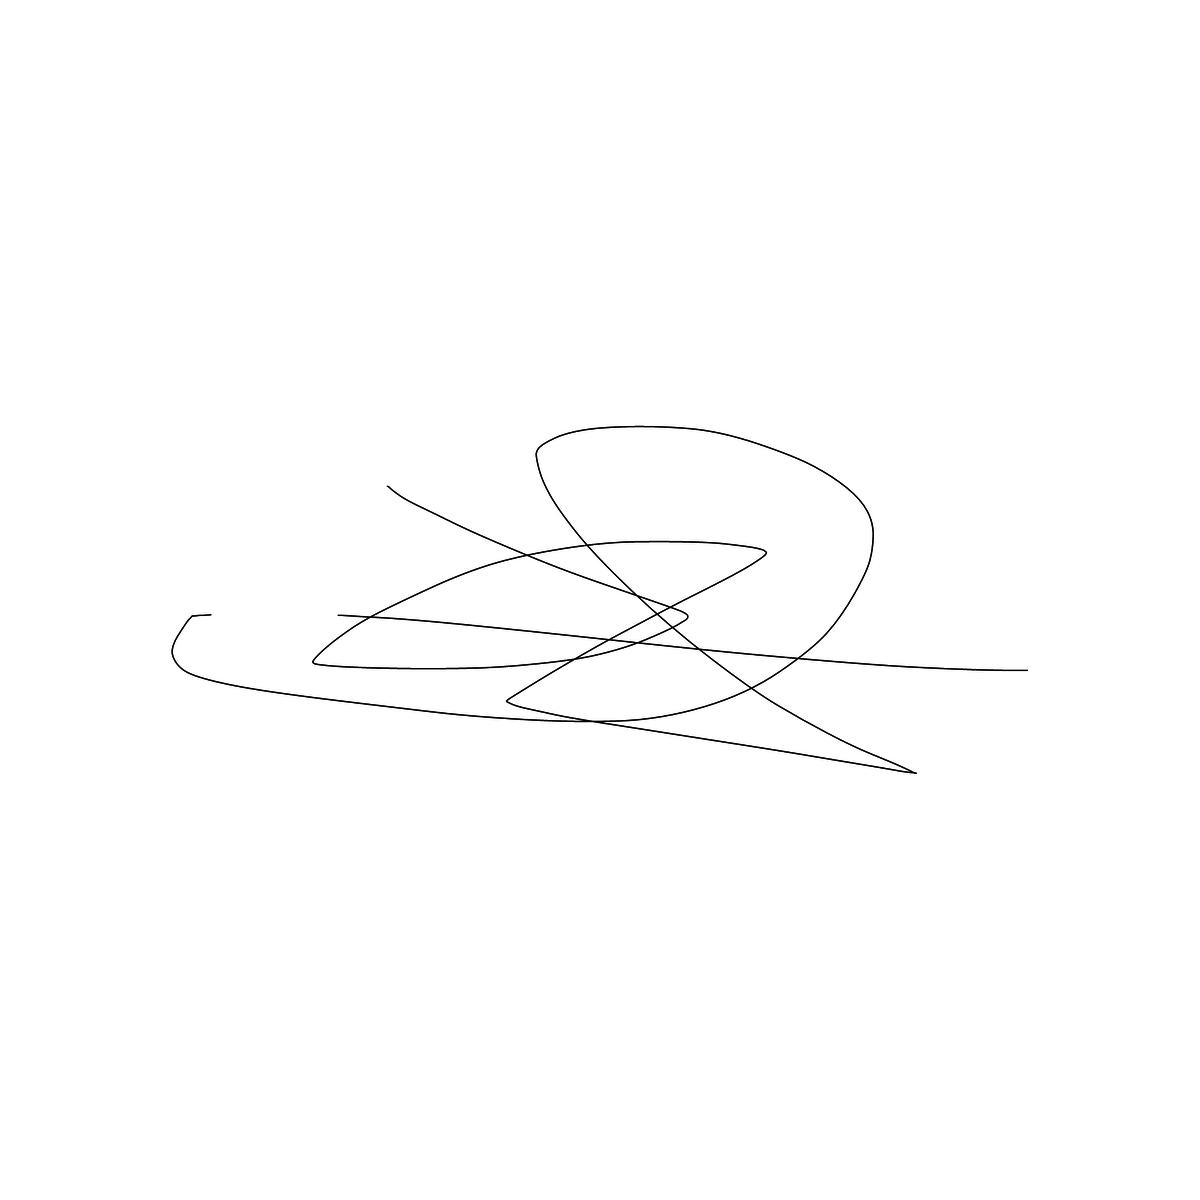 BAAAM drawing#8235 lat:39.9151992797851560lng: 32.7153778076171900